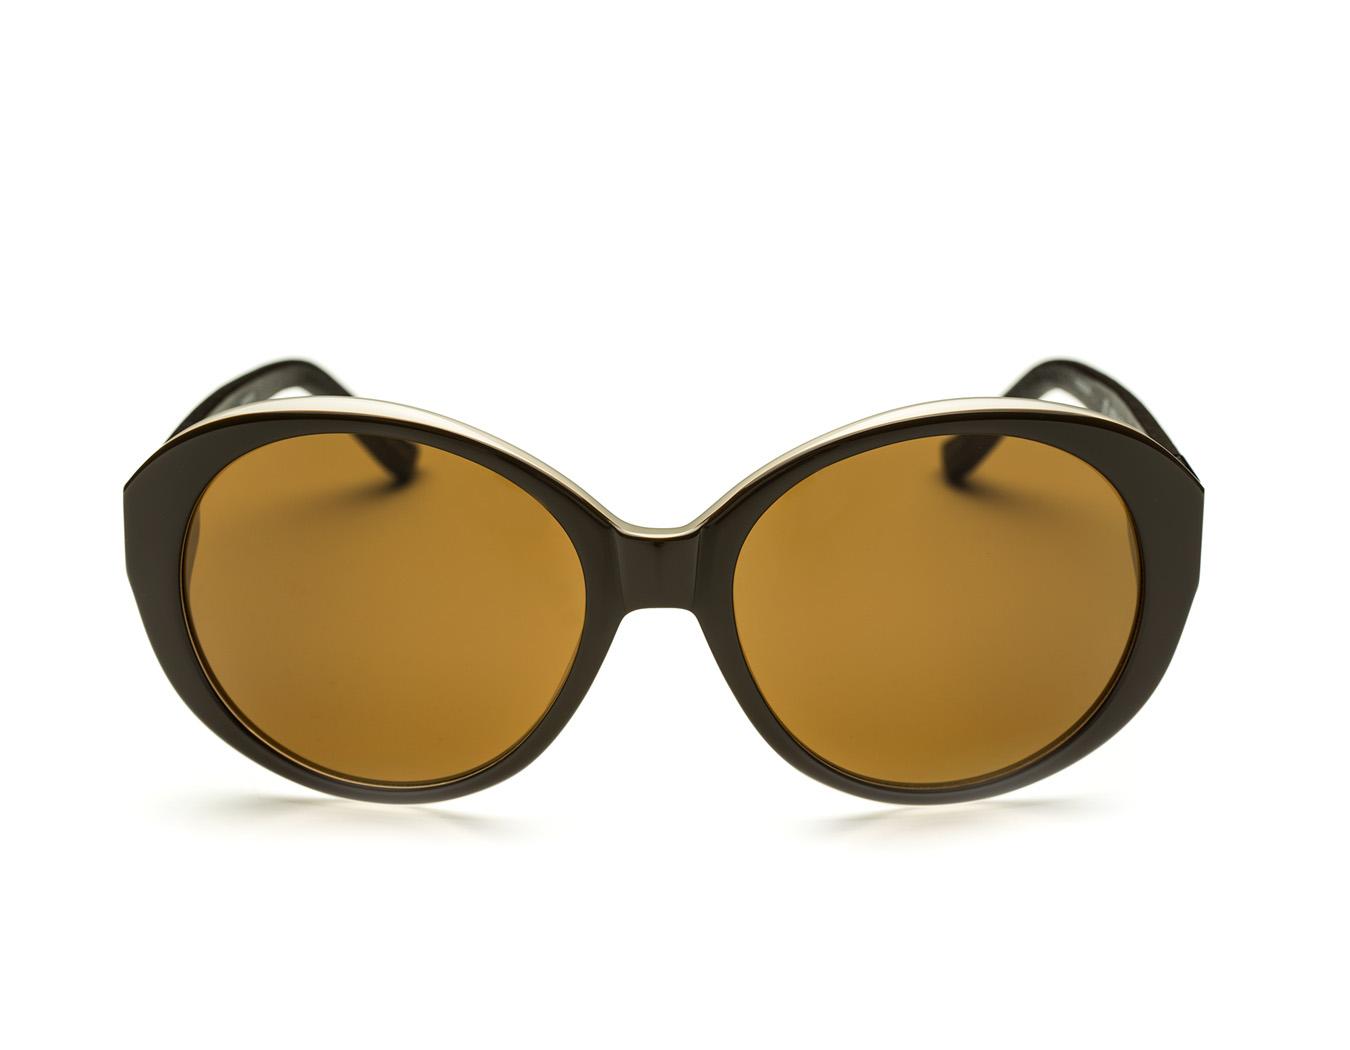 product-shot-sunglasses.jpg